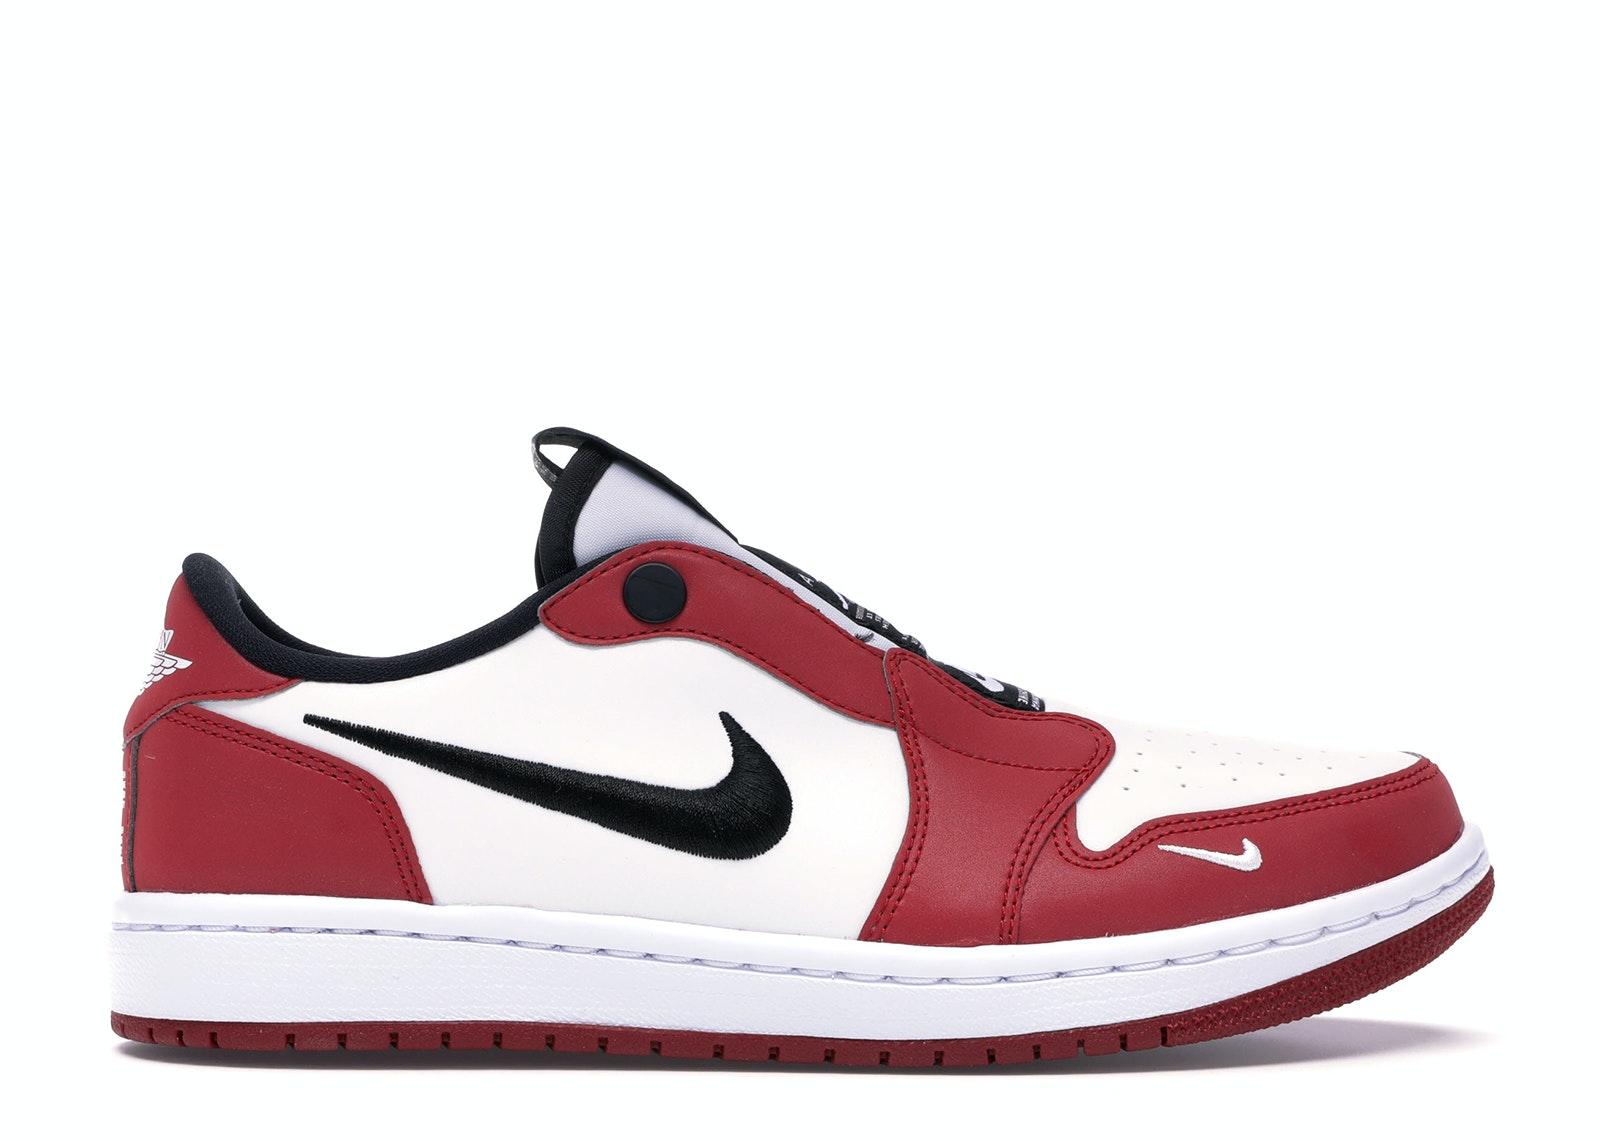 Jordan 1 Retro Low Slip Chicago (W)